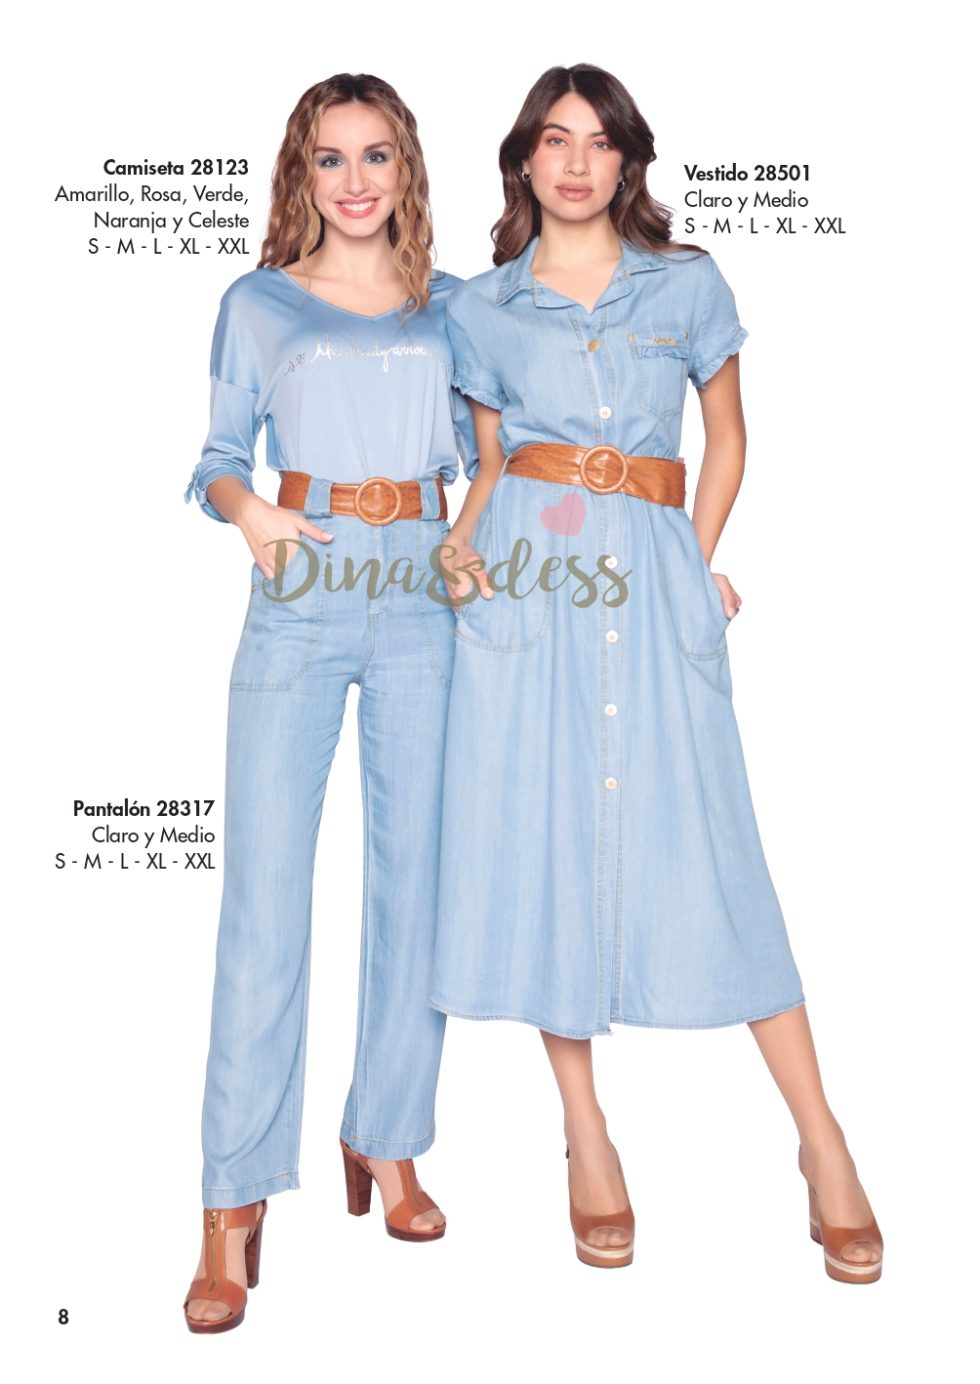 Verano 2021 Dina&Dess Clientes_page-0010